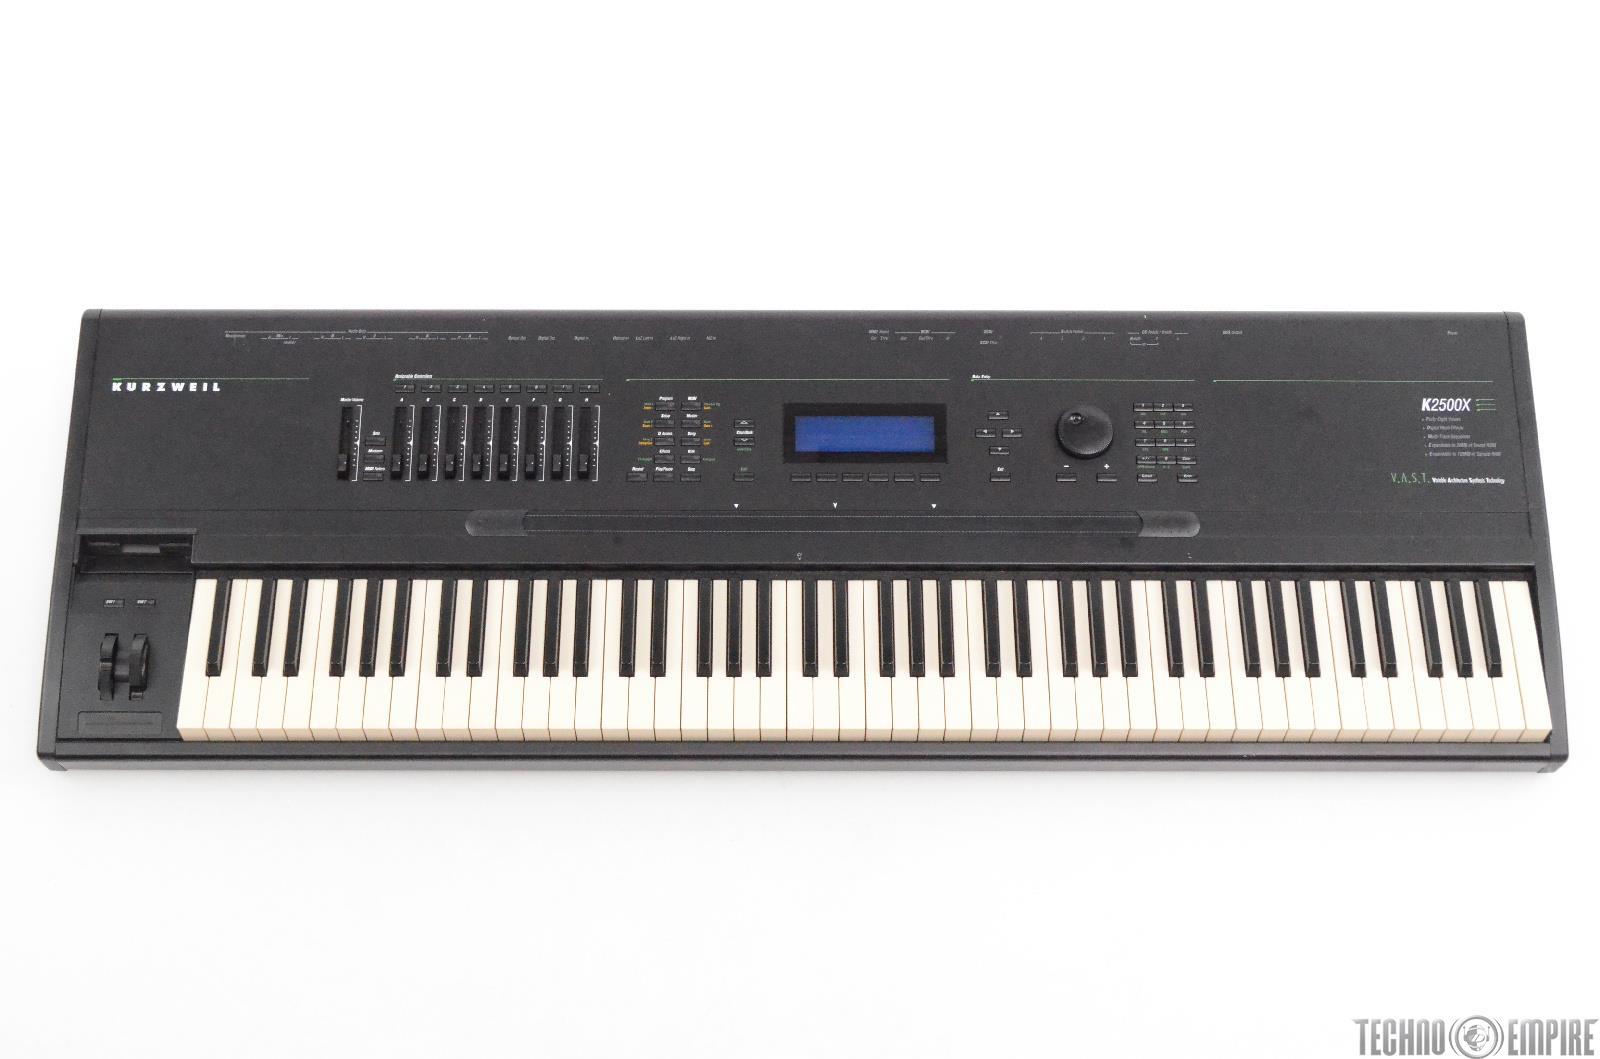 Kurzweil K2500X 88-Key Weighted Keyboard Synthesizer Sampler Workstation #30608